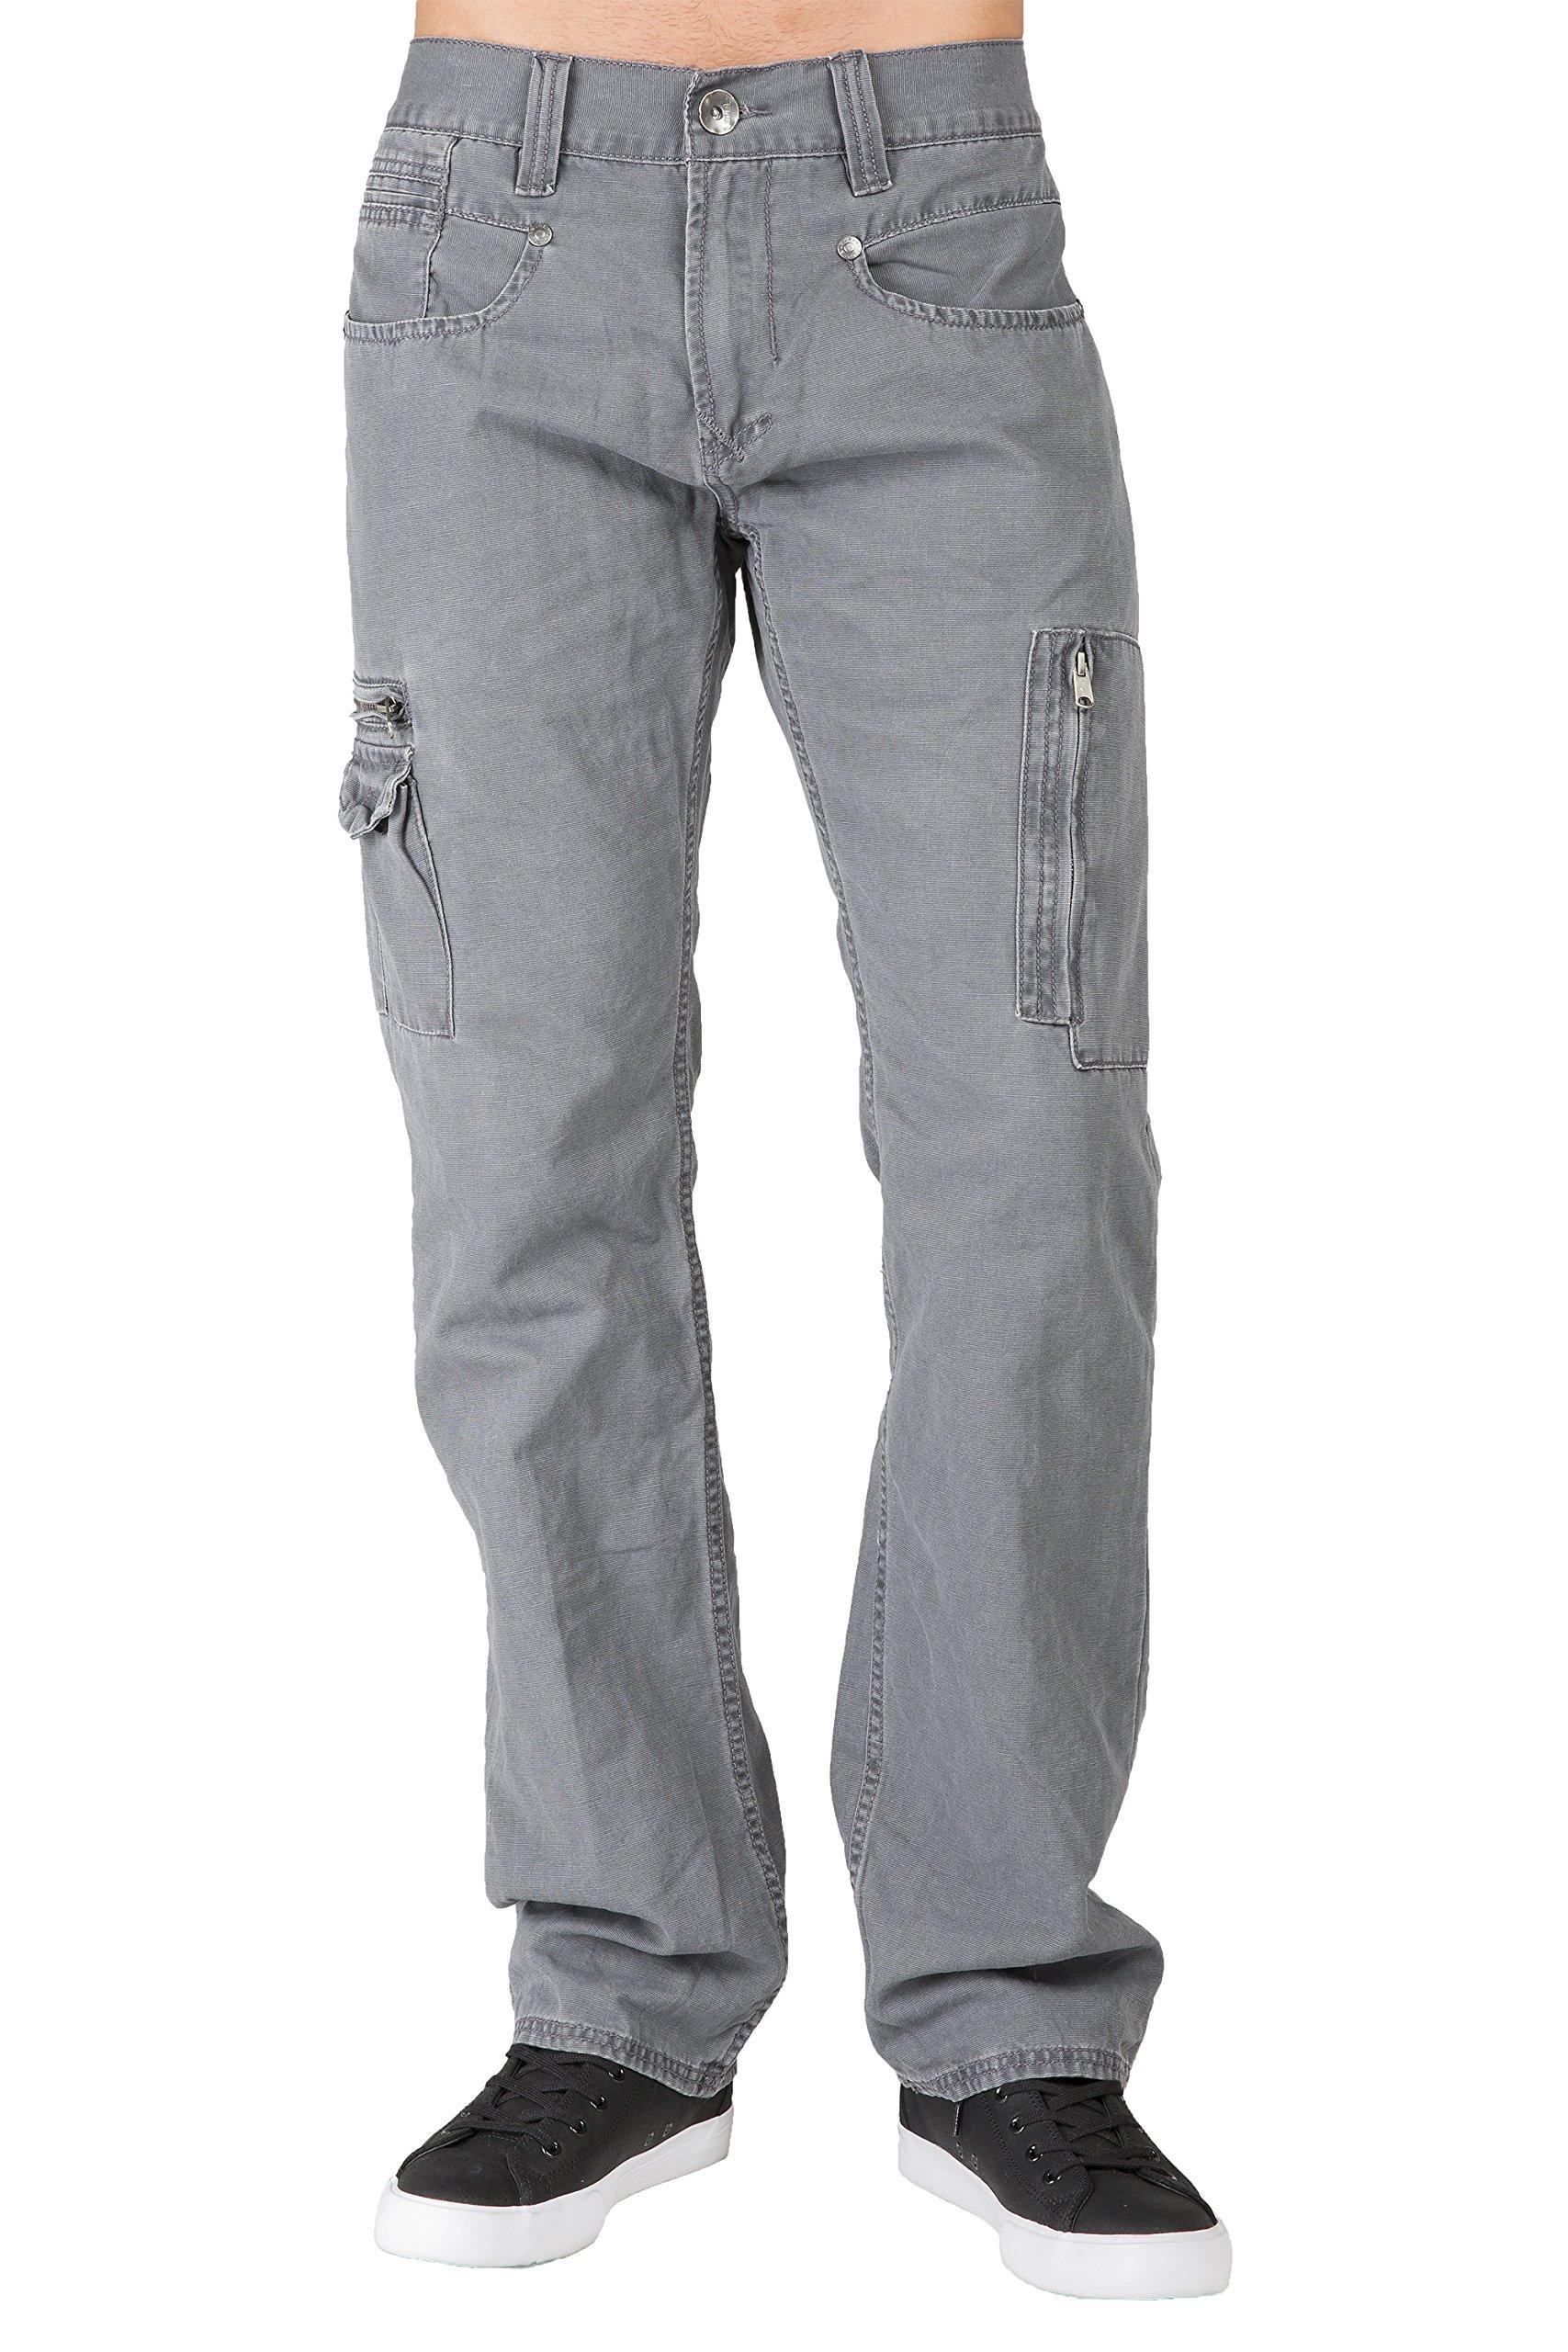 1d4631ed4e4 Men's Relaxed Straight Gray Canvas Premium Jeans Cargo Zipper Pockets